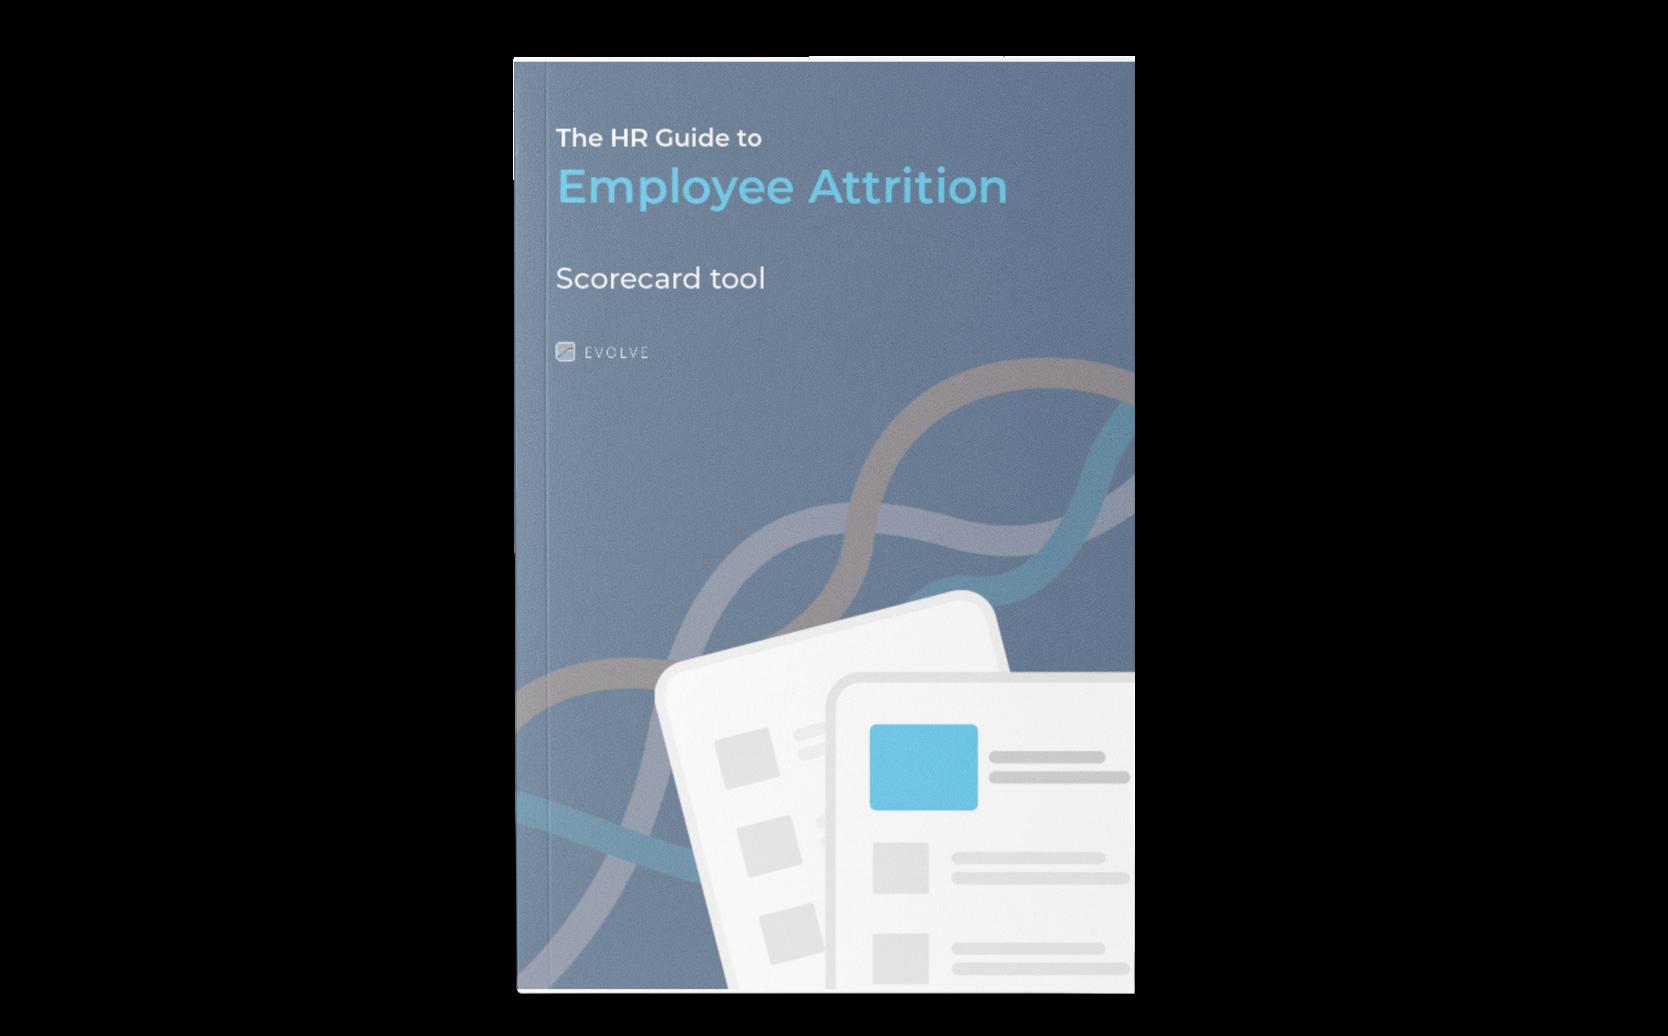 The Employee Attrition Scorecard Cover